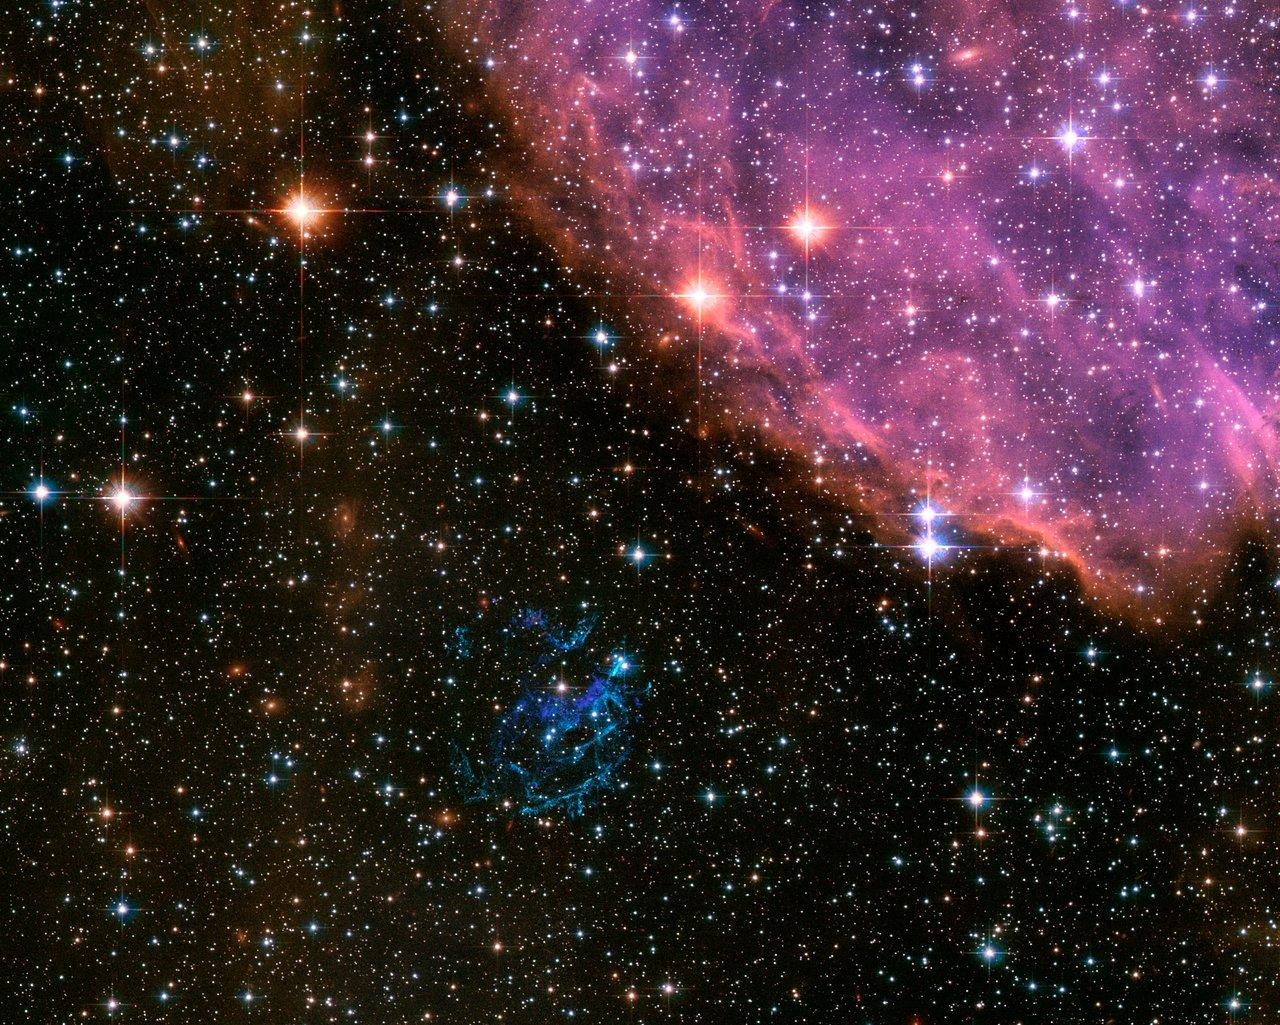 hubble telescope explosions - photo #17